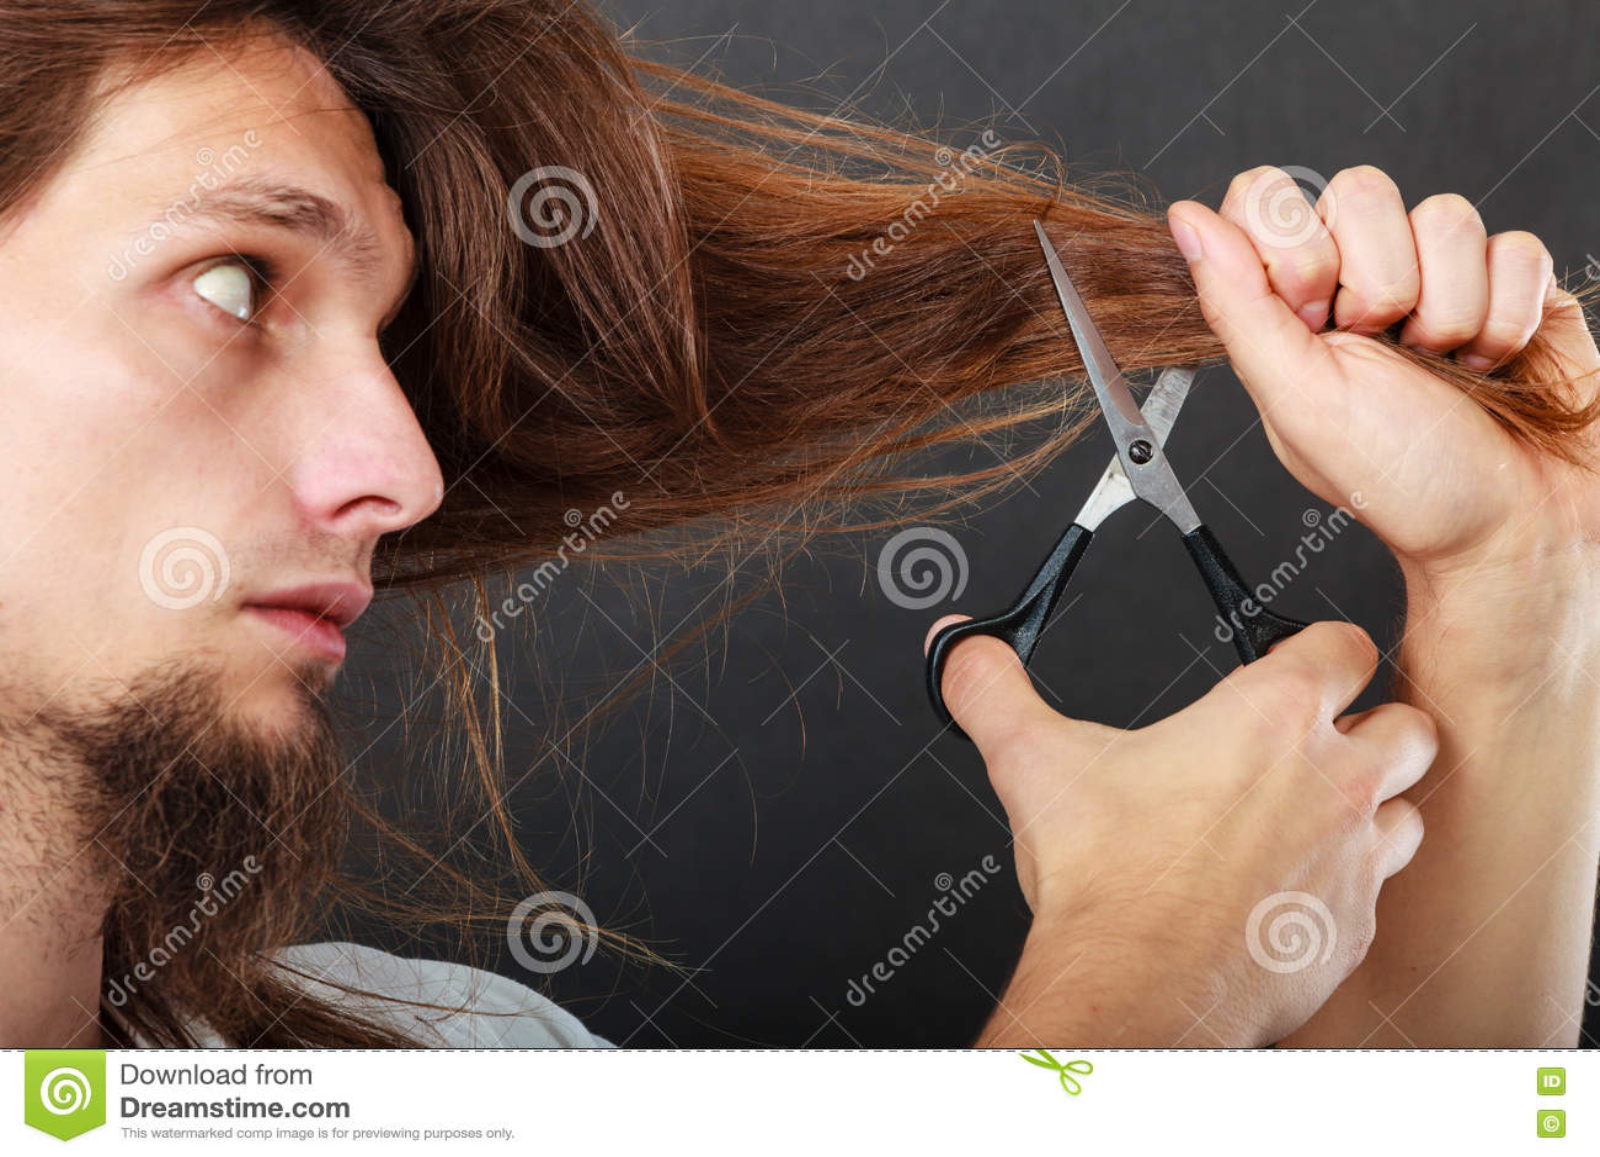 Barber cutting hair stock photo. Image of short, scissors ...